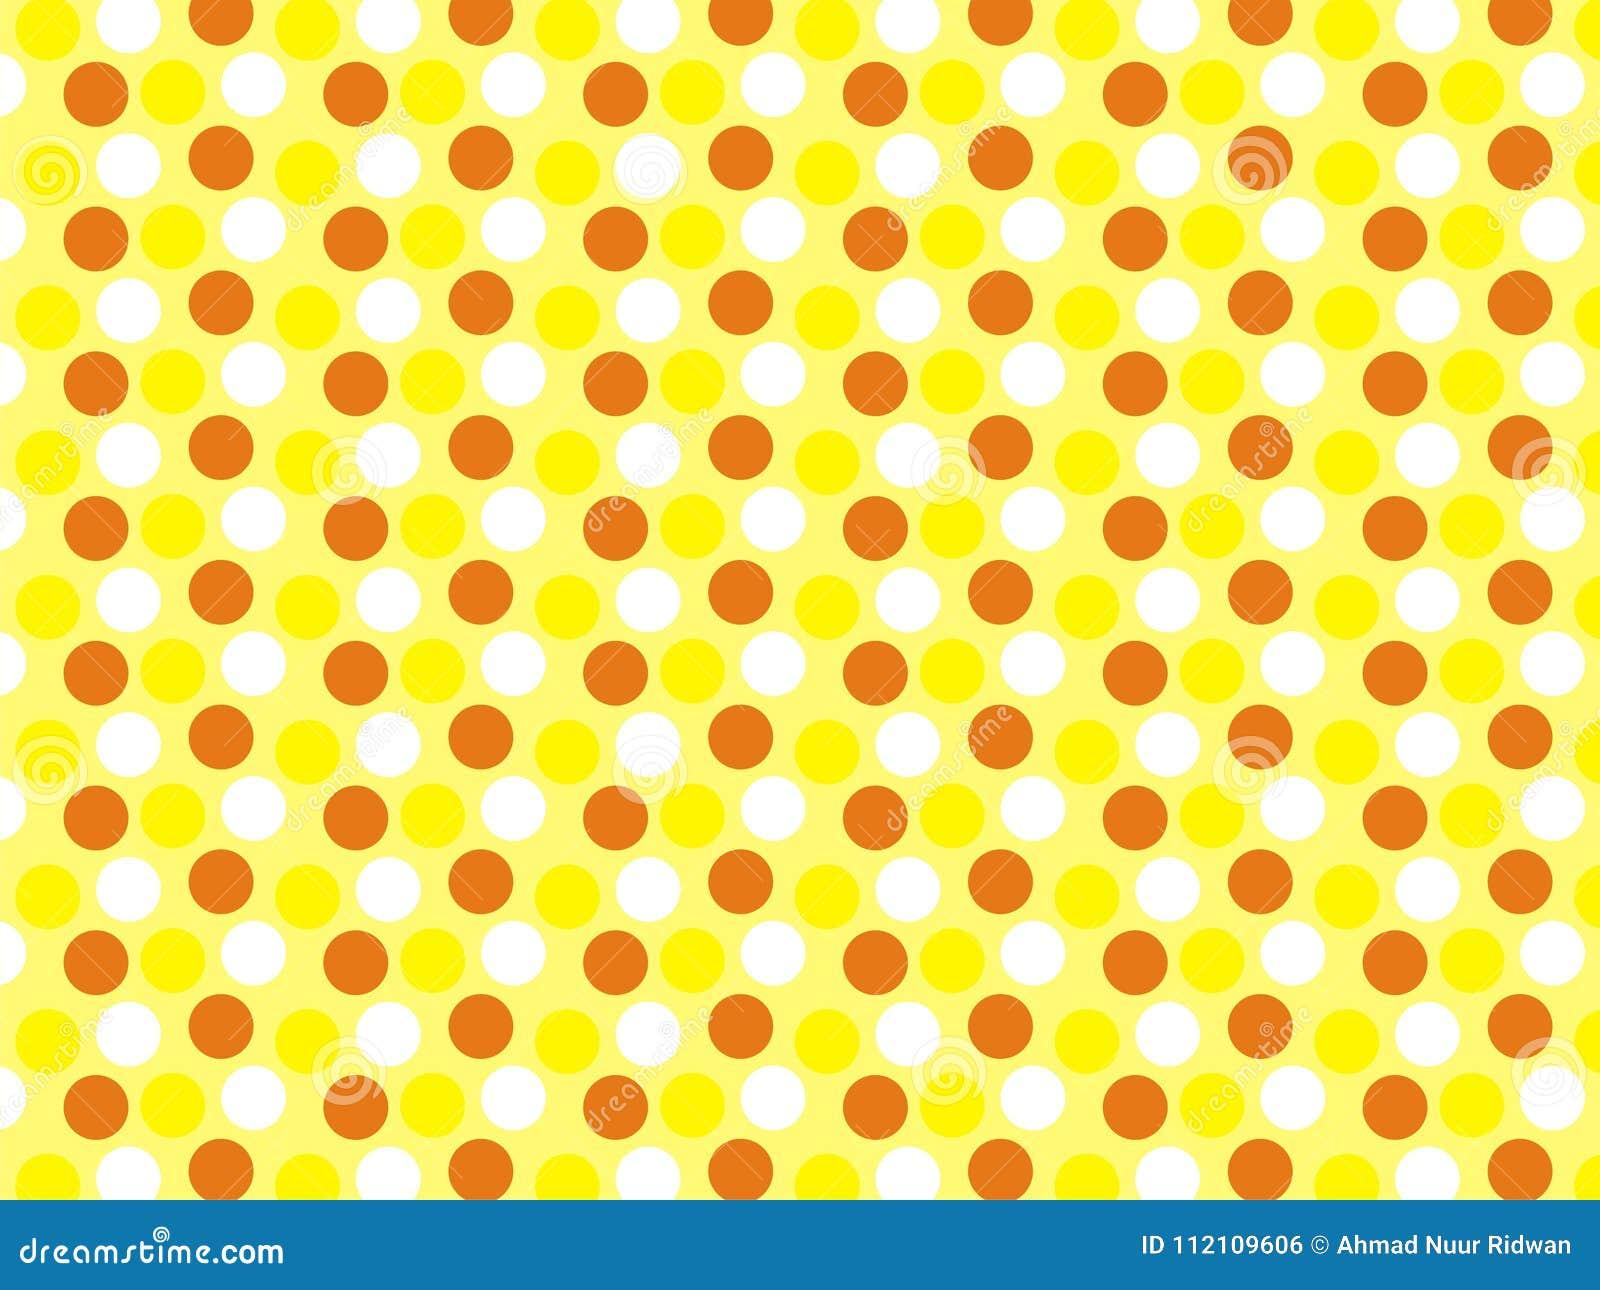 Polcadot Art 3 Colors Yellow Wallpaper Stock Illustration ...